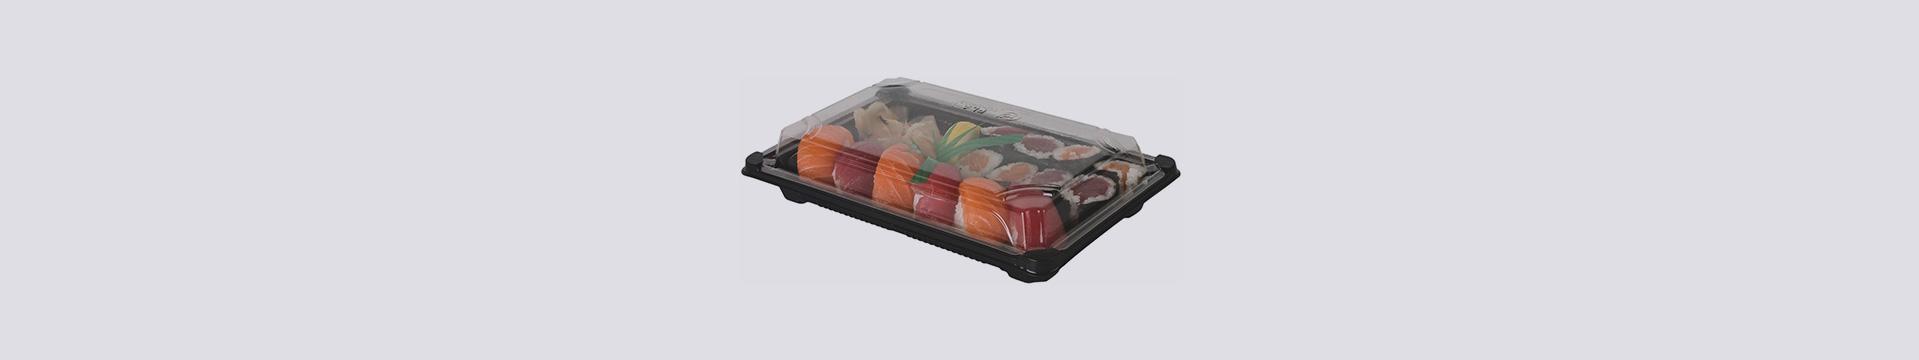 Embalagens de Sushi